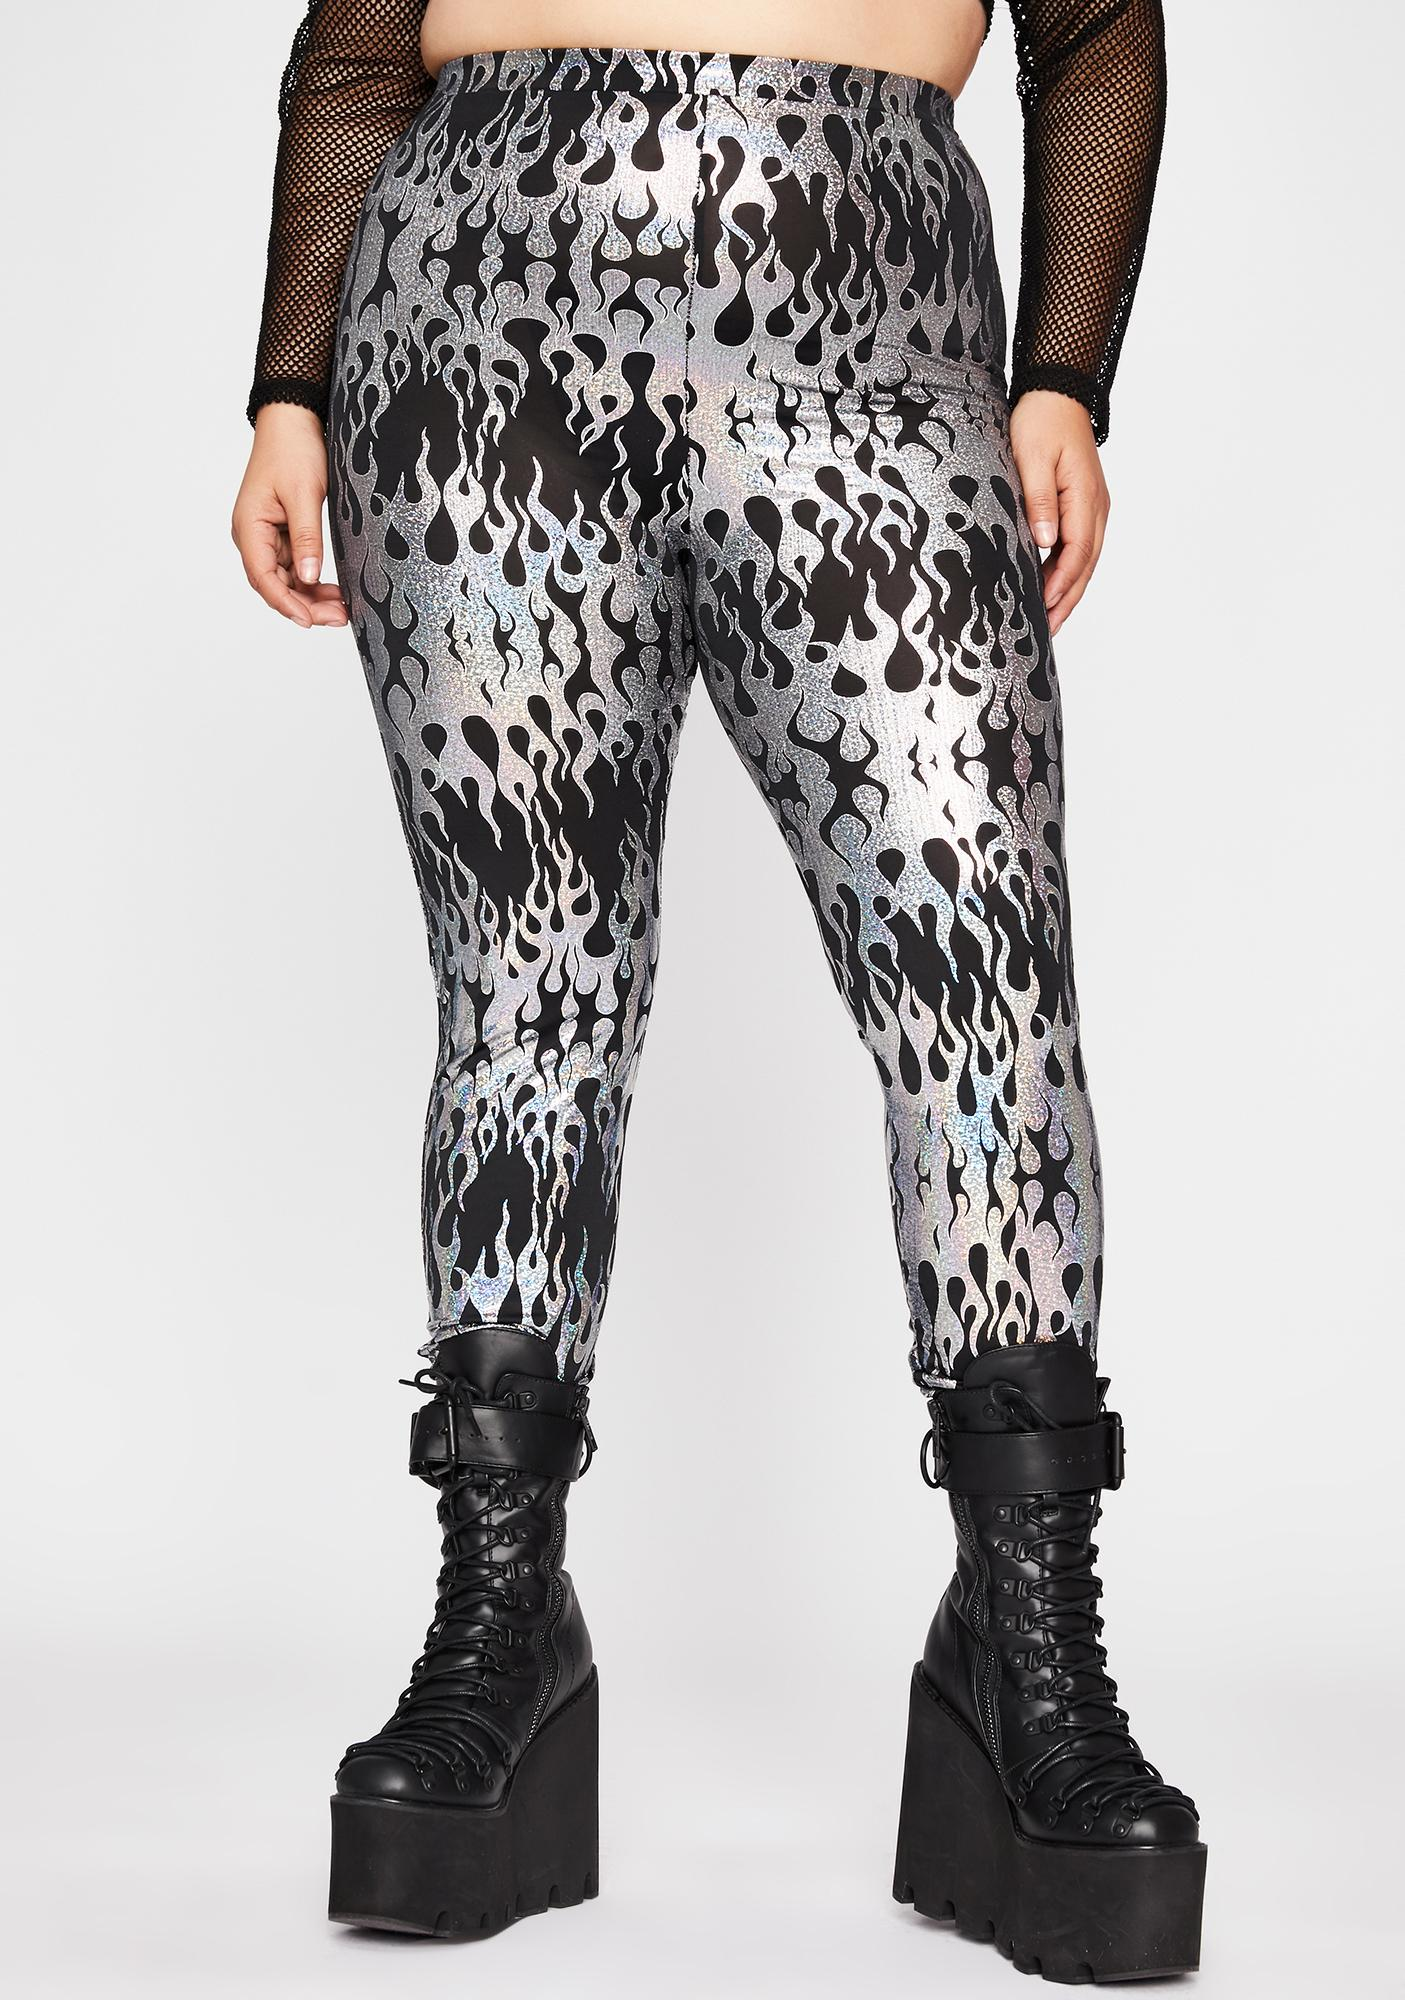 True Ravetopia Fuse Printed Leggings